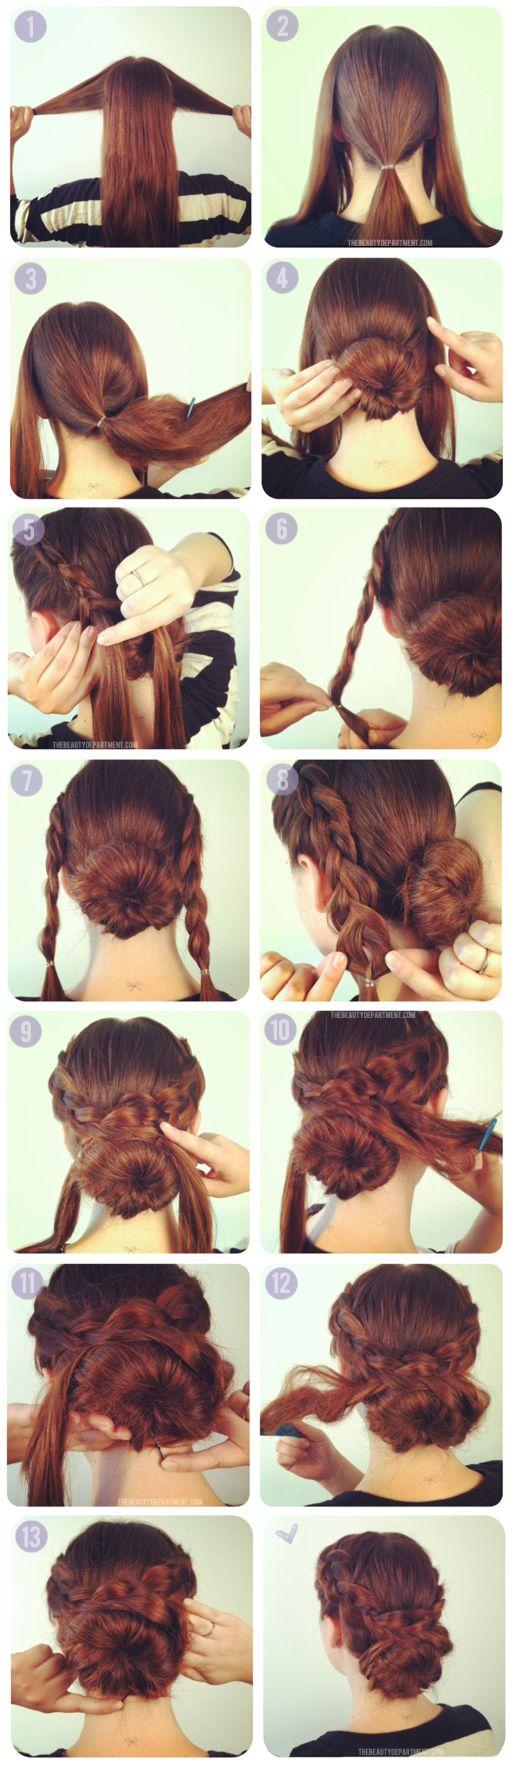 braided cross bun updo